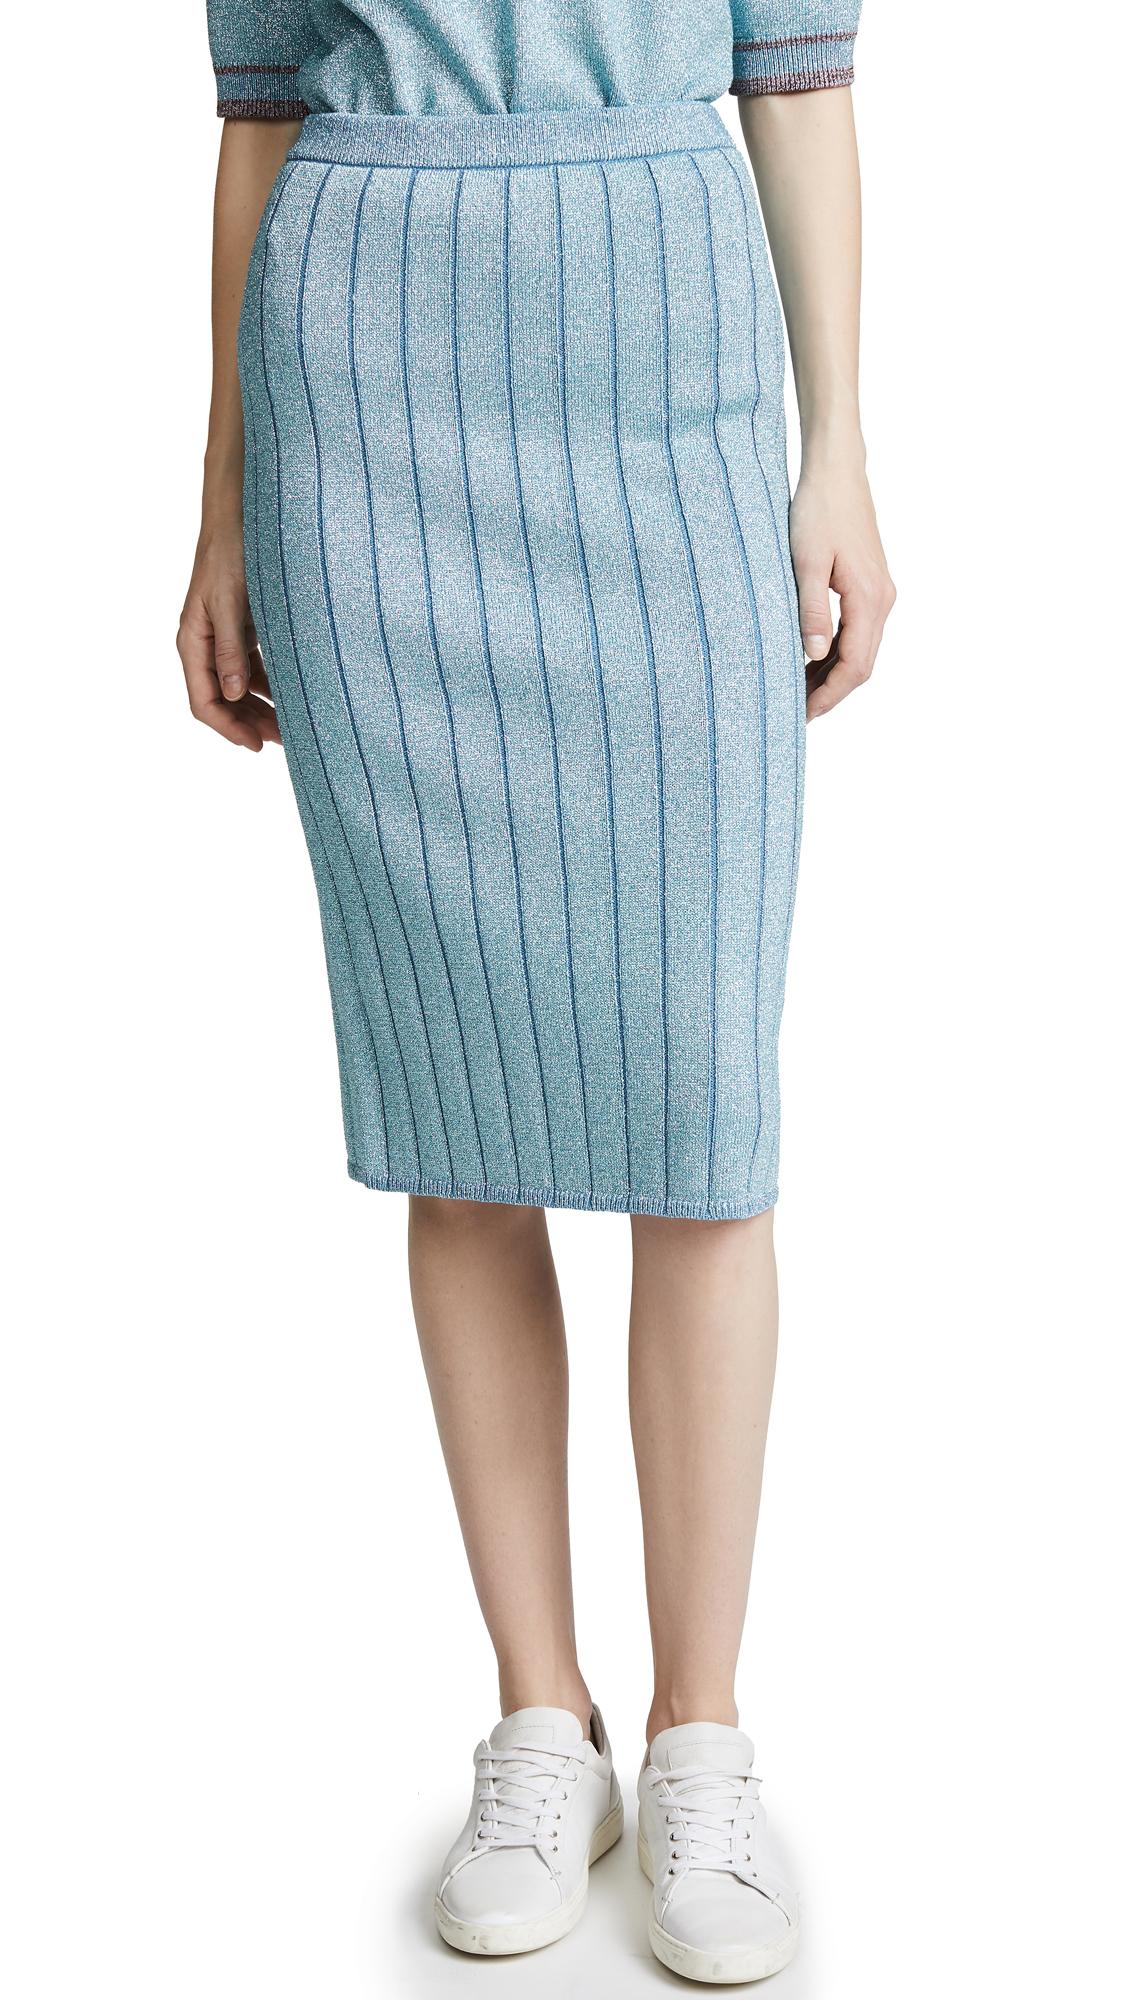 Marc Jacobs Metallic Pencil Skirt